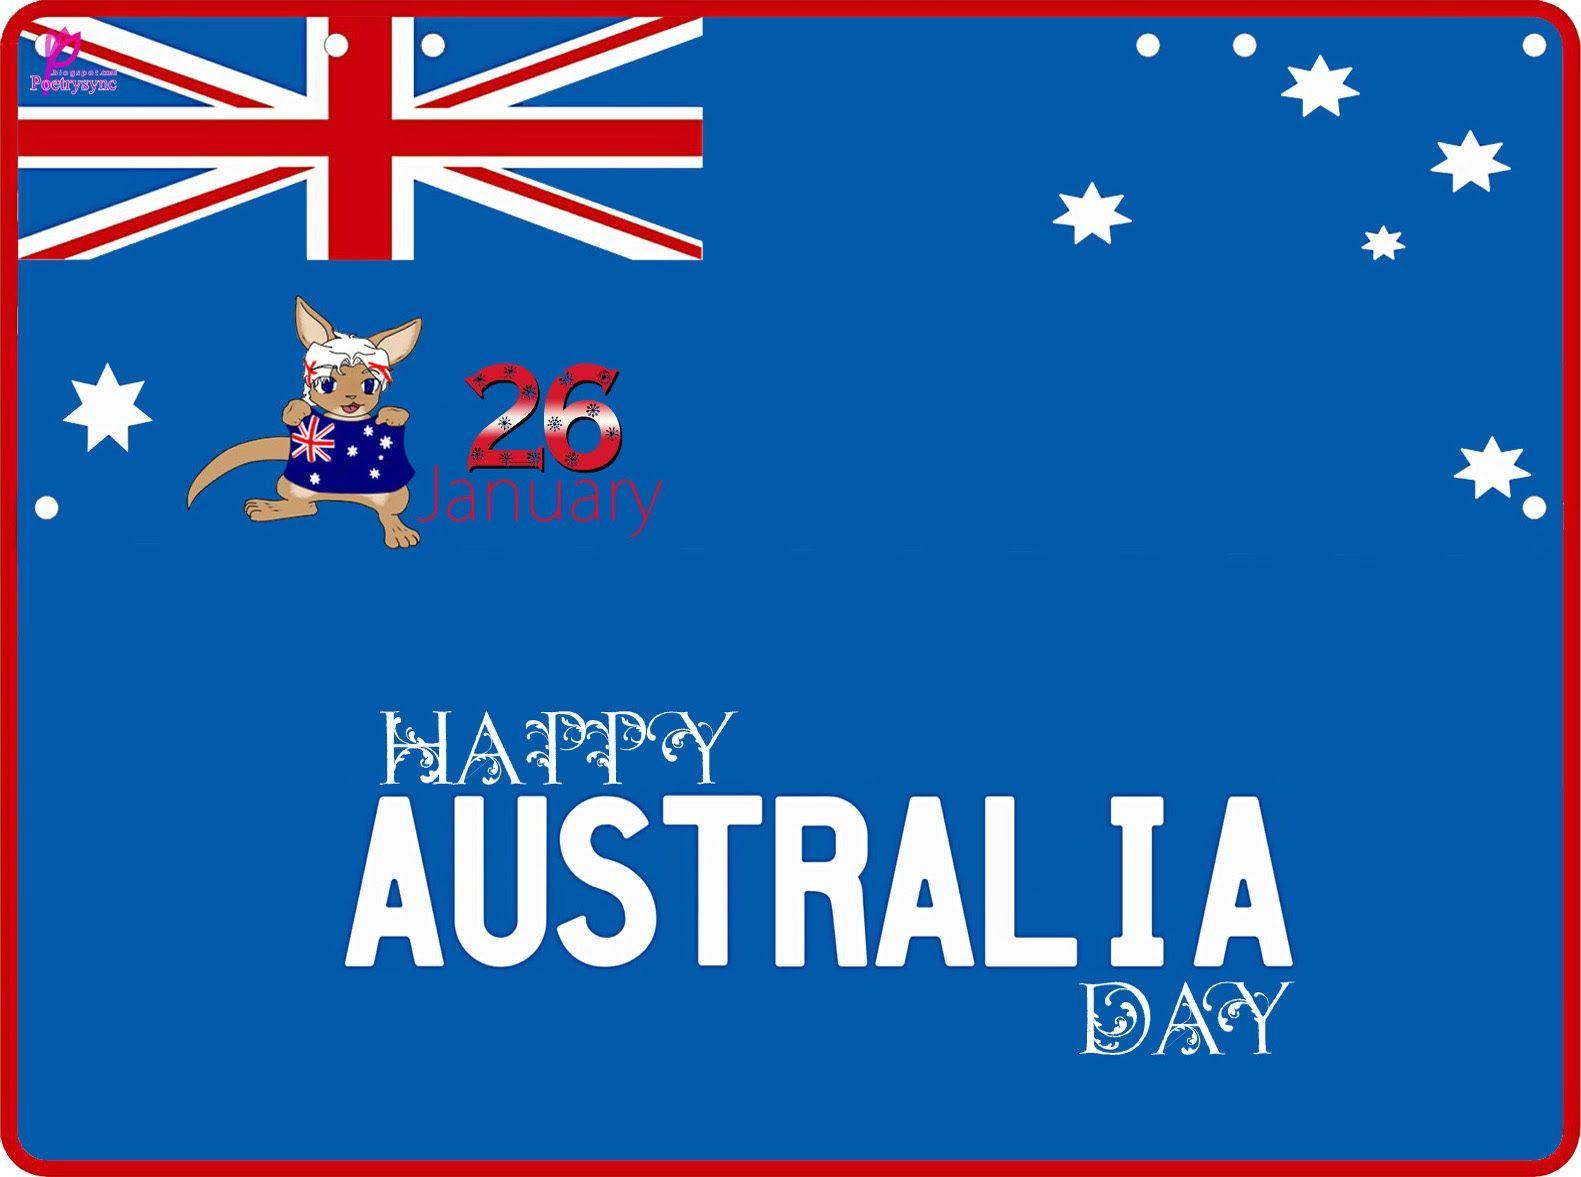 Happy australia day wishes card 26 january in australia wallpaper happy australia day wishes card 26 january in australia wallpaper australia day pinterest australia kristyandbryce Gallery